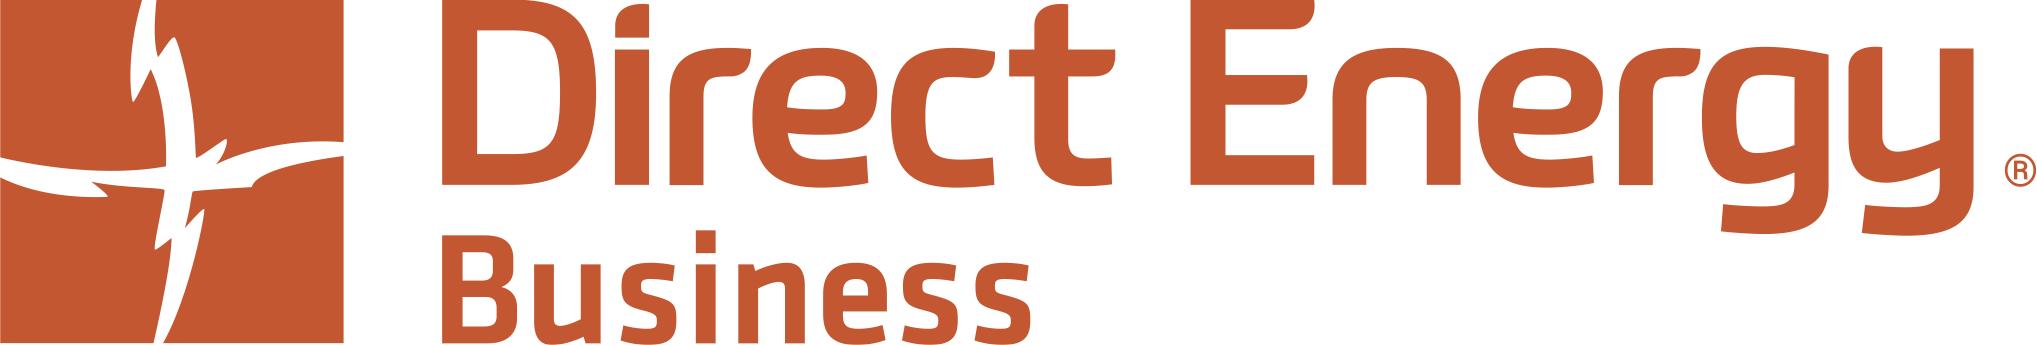 Direct-Energy-Business-2016_ORANGE_Horiz.png